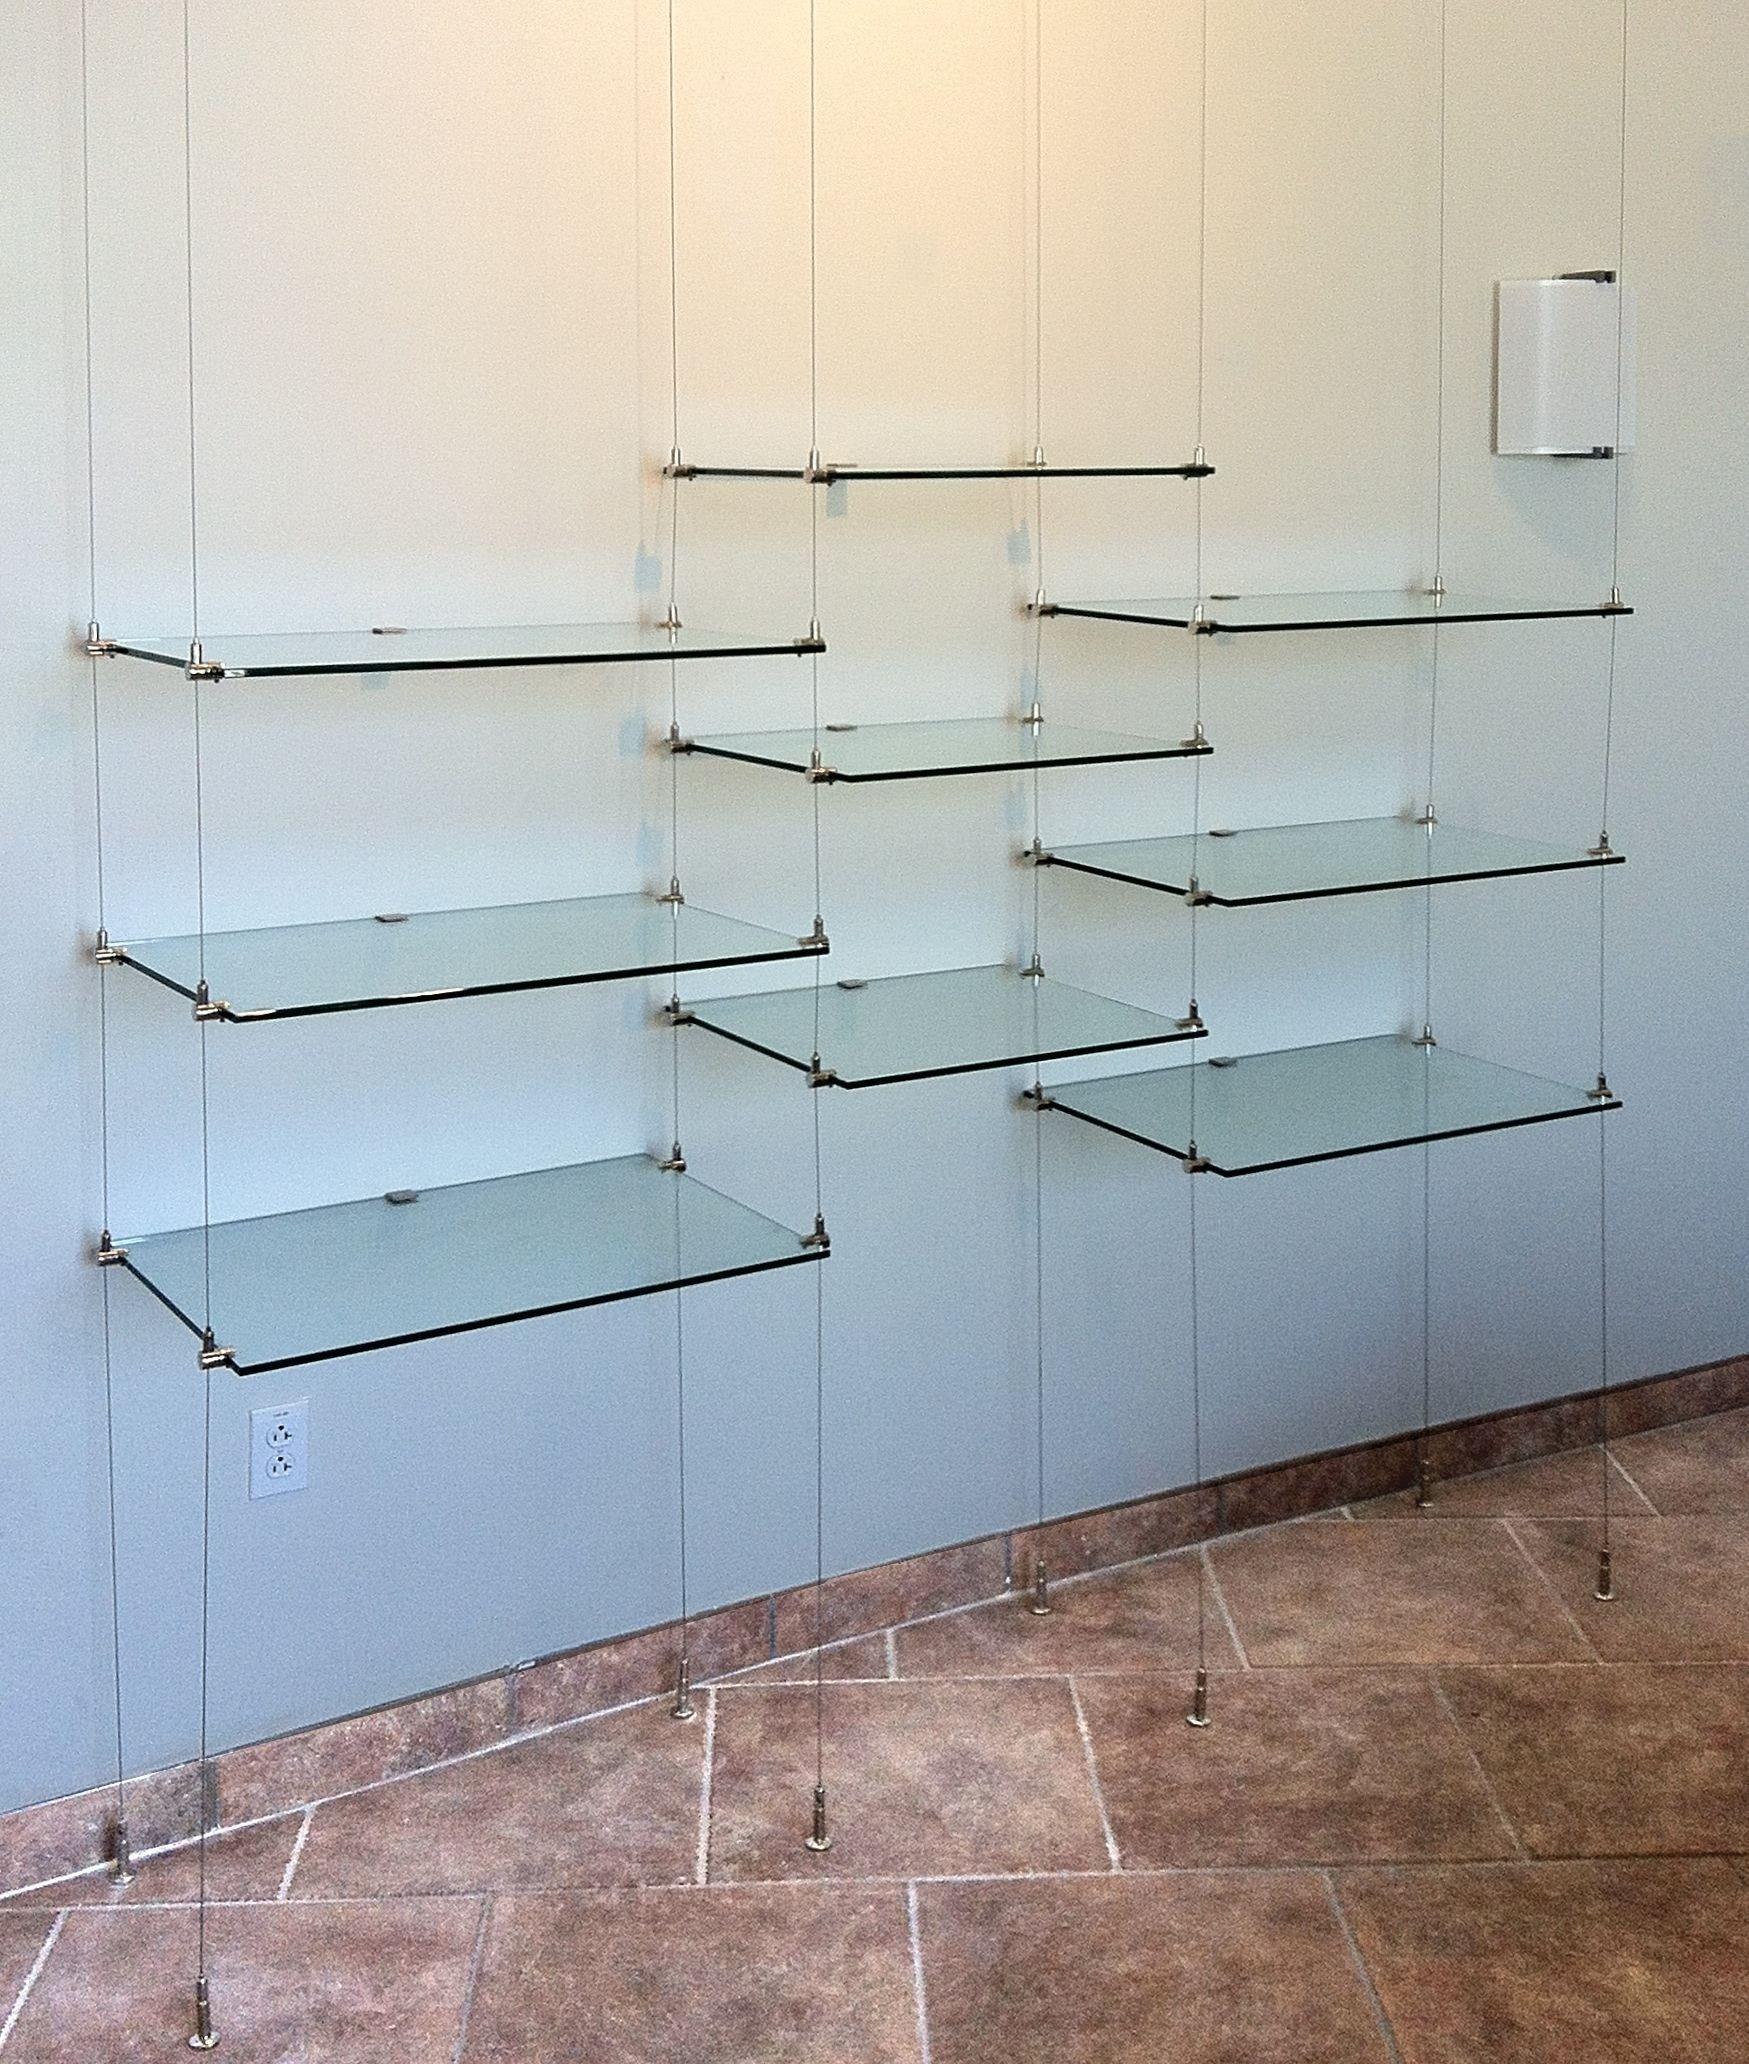 Ceiling Hanging Shelves Kitchen Kitchen Shelf Glass On Stainless Regarding Suspended Glass Shelves (Image 2 of 15)